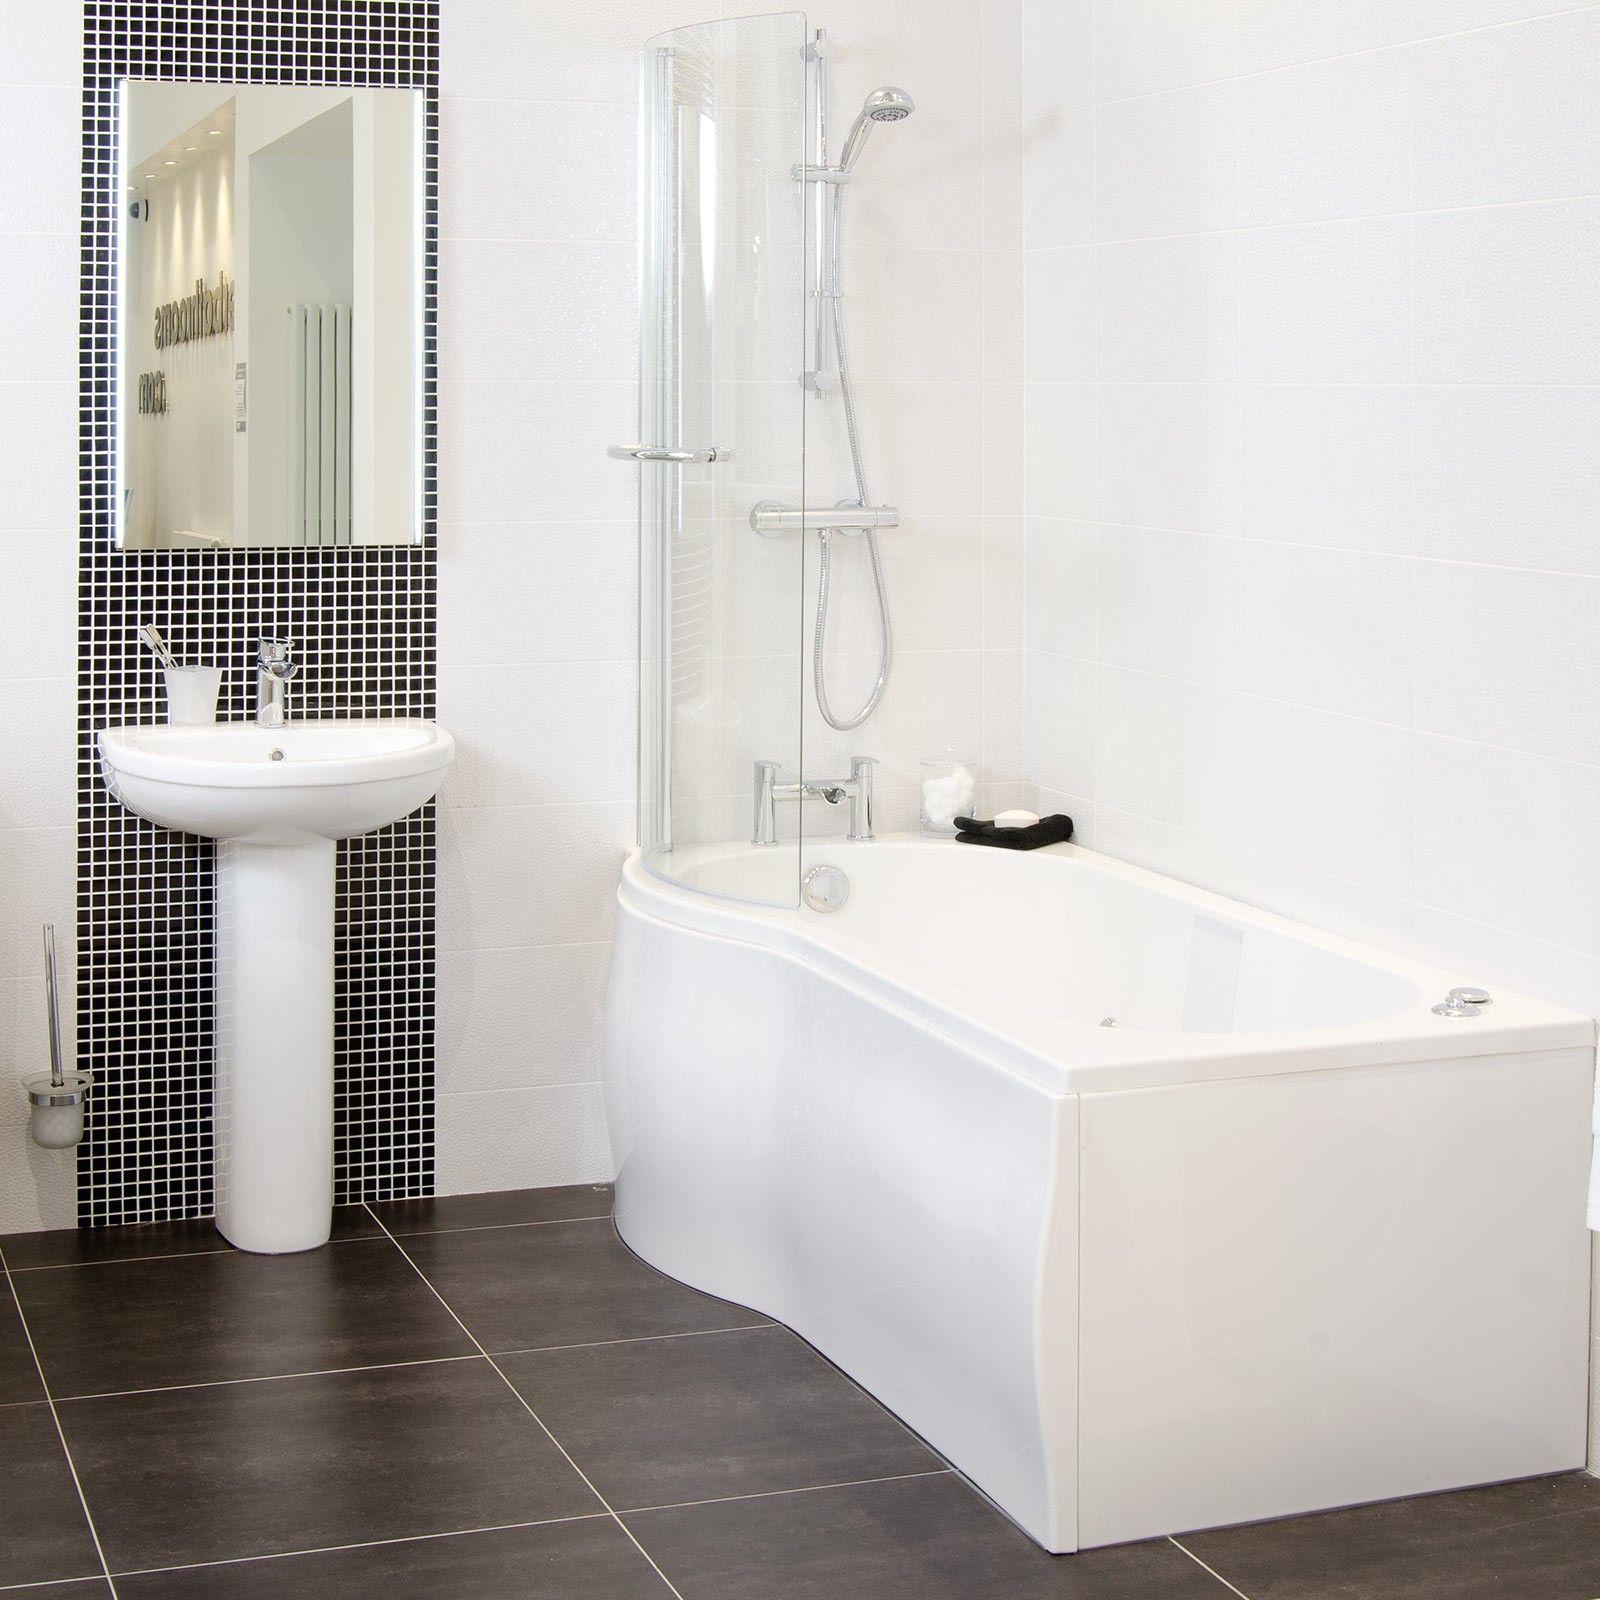 Capua Wall Tile - Black And White Bathroom Ideas - White Tiles ...